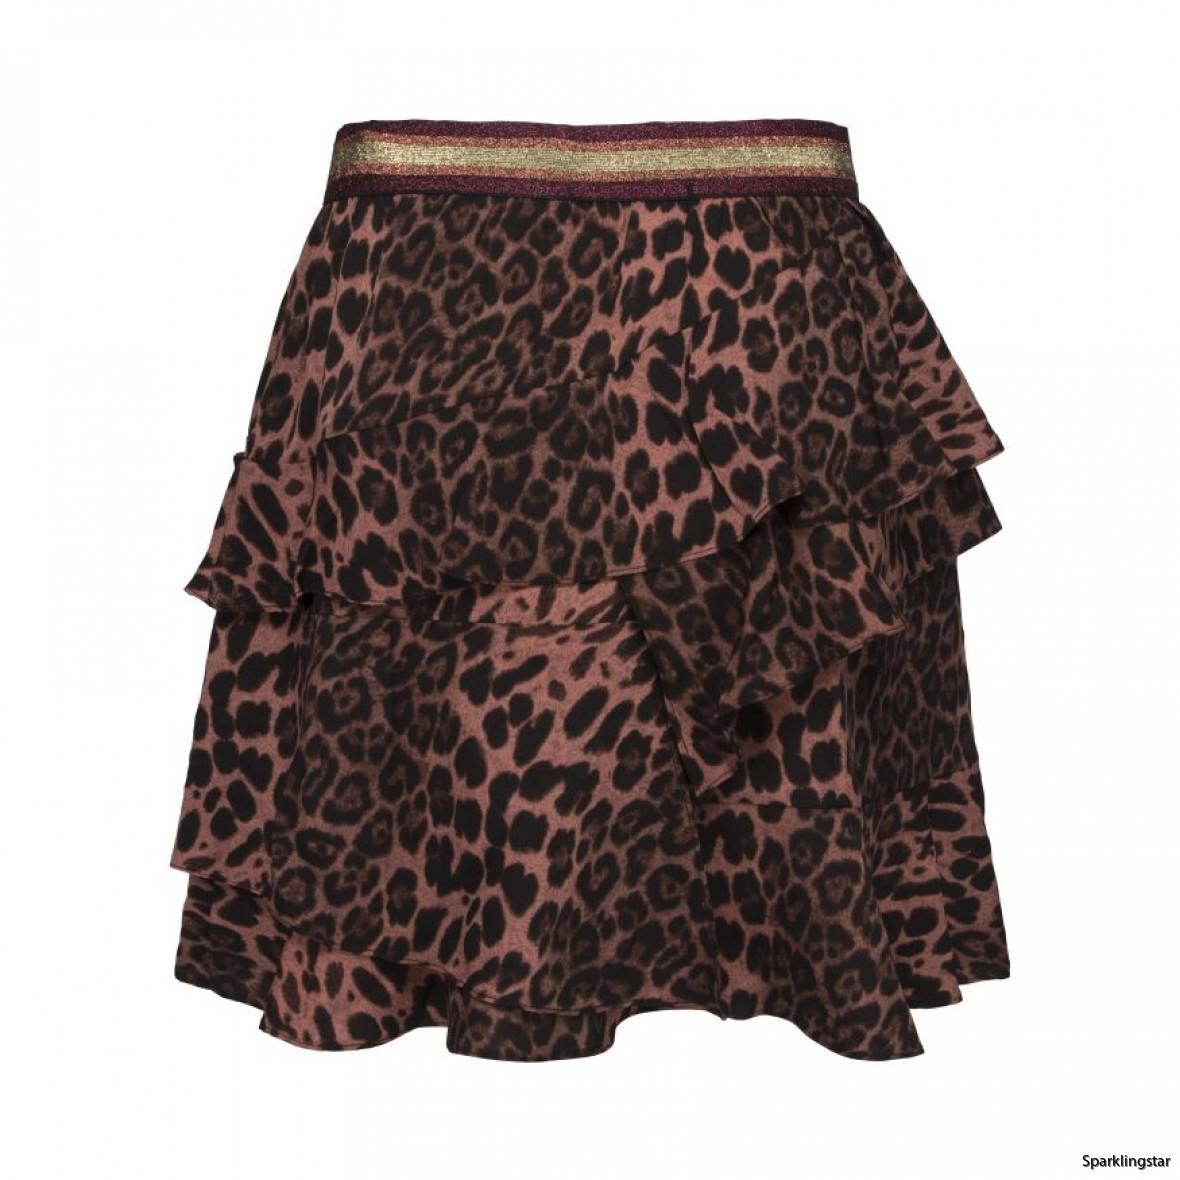 Sofie Schnoor Madonna Skirt